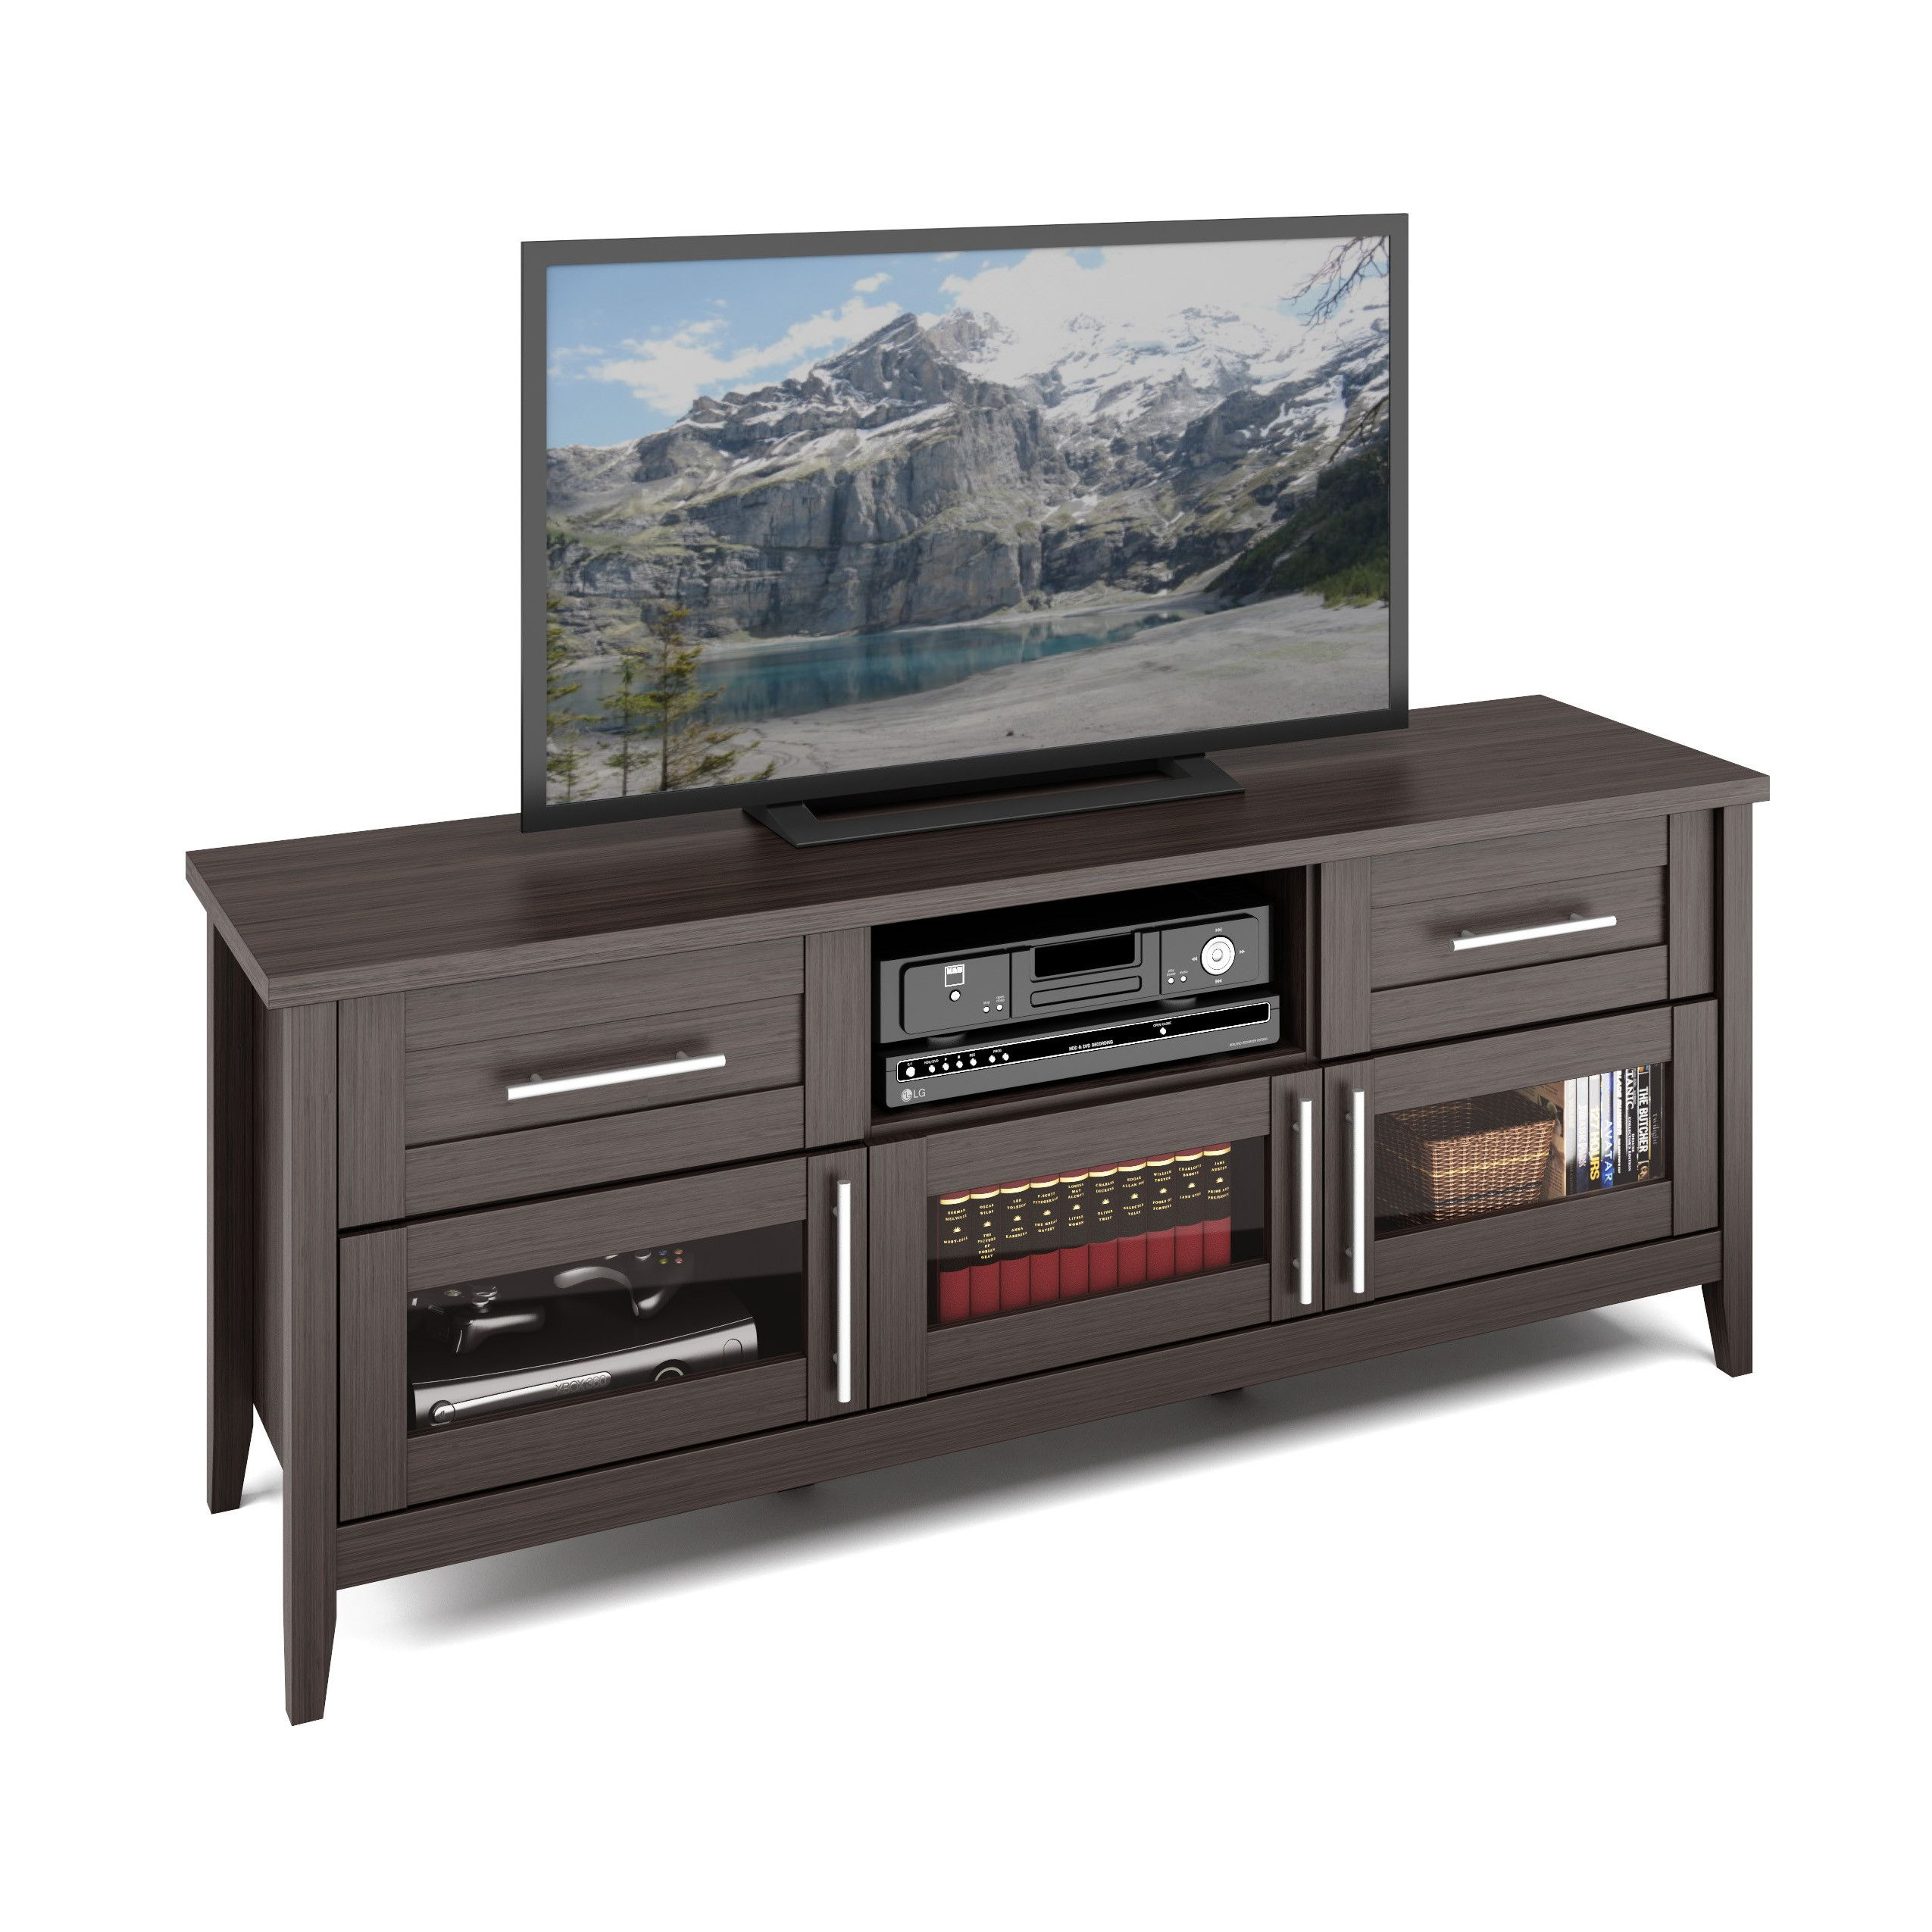 Dcor design jackson tv stand tt pinterest tv stands